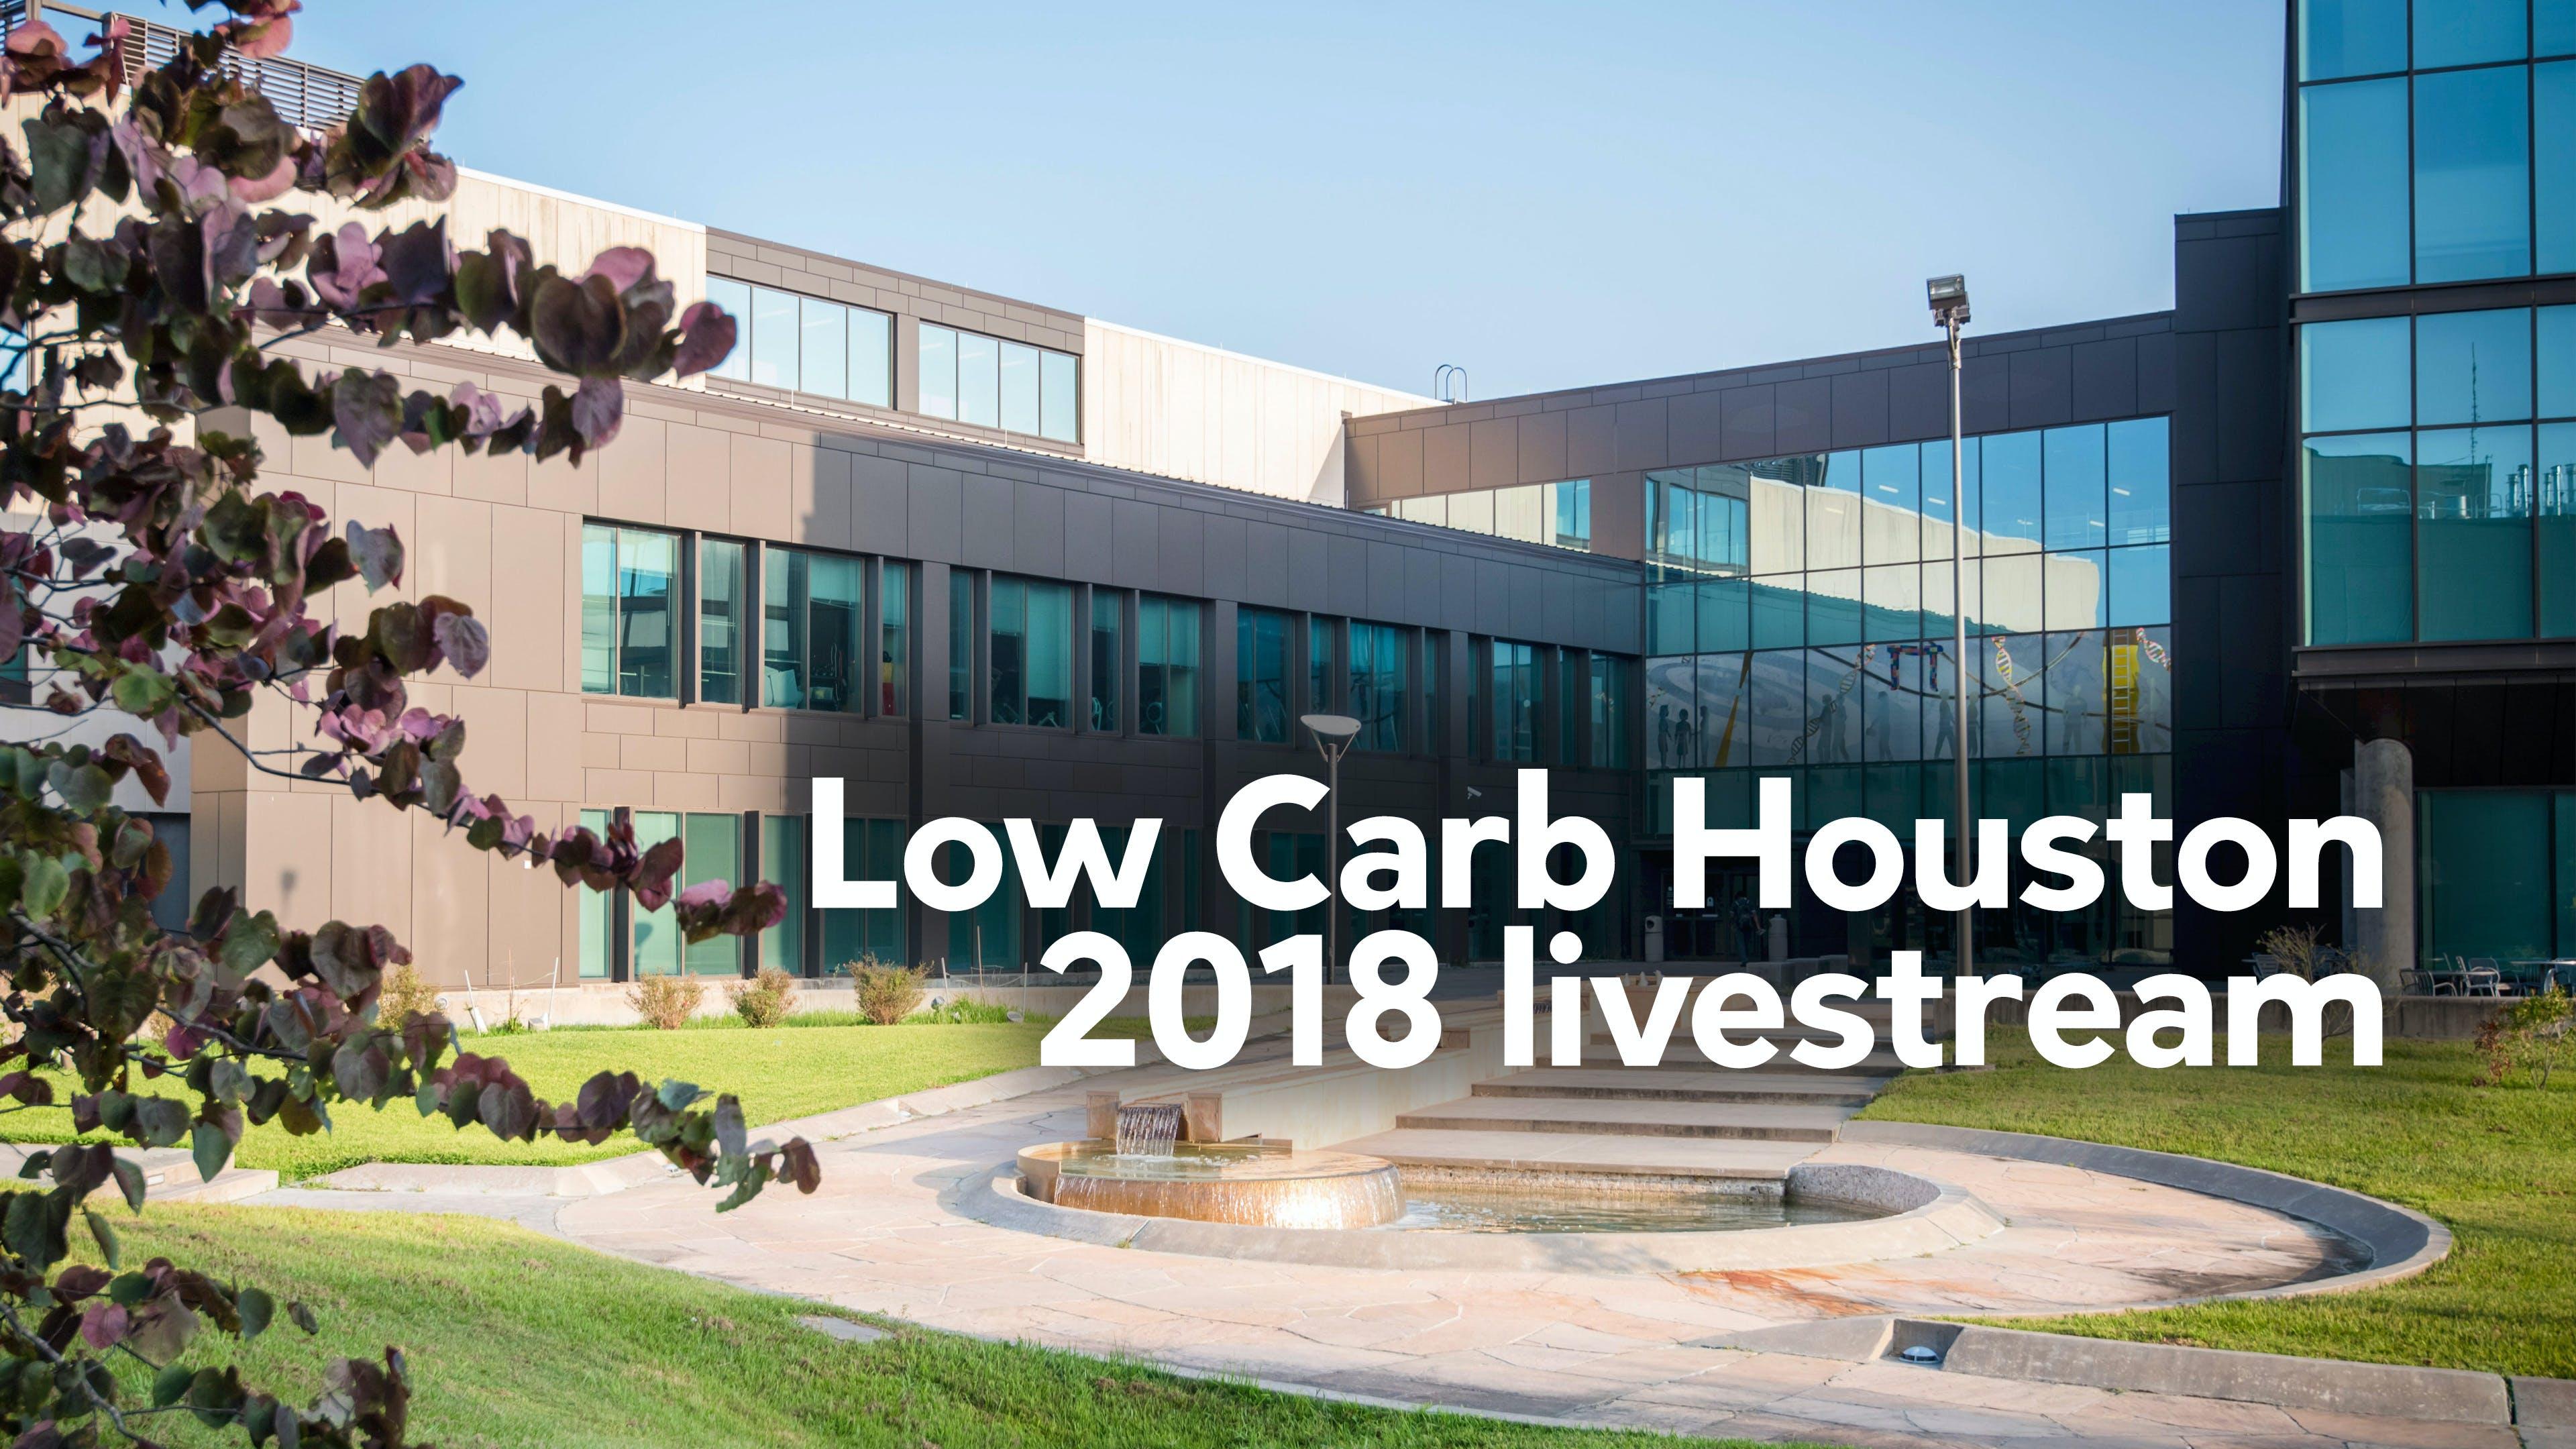 Low Carb Houston 2018 livestream